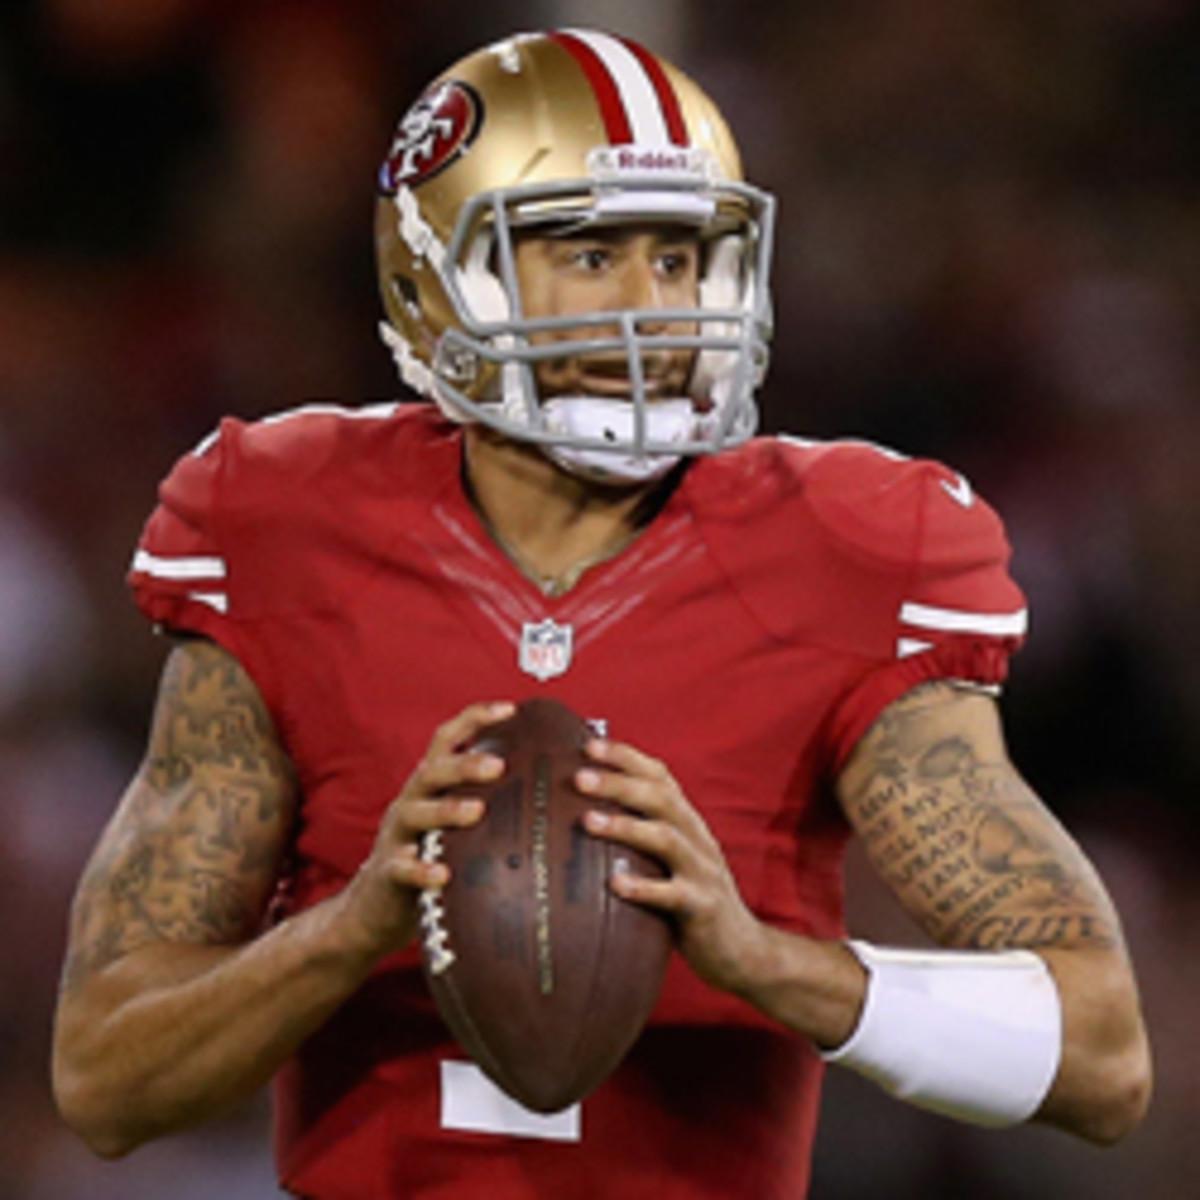 49ers coach Jim Harbaugh worries about quarterback Colin Kaepernick's workout regiment.  (Ezra Shaw/Getty Images)